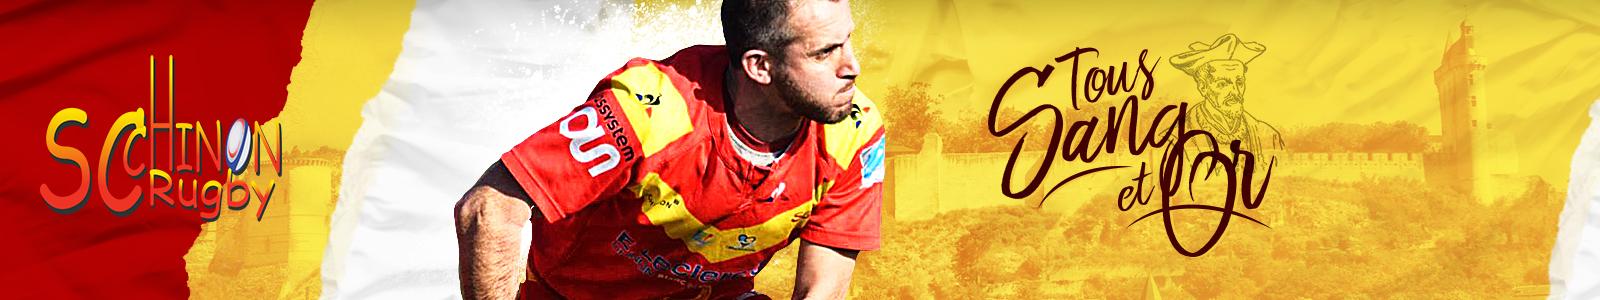 Sporting Club Chinonais Rugby : site officiel du club de rugby de CHINON - clubeo